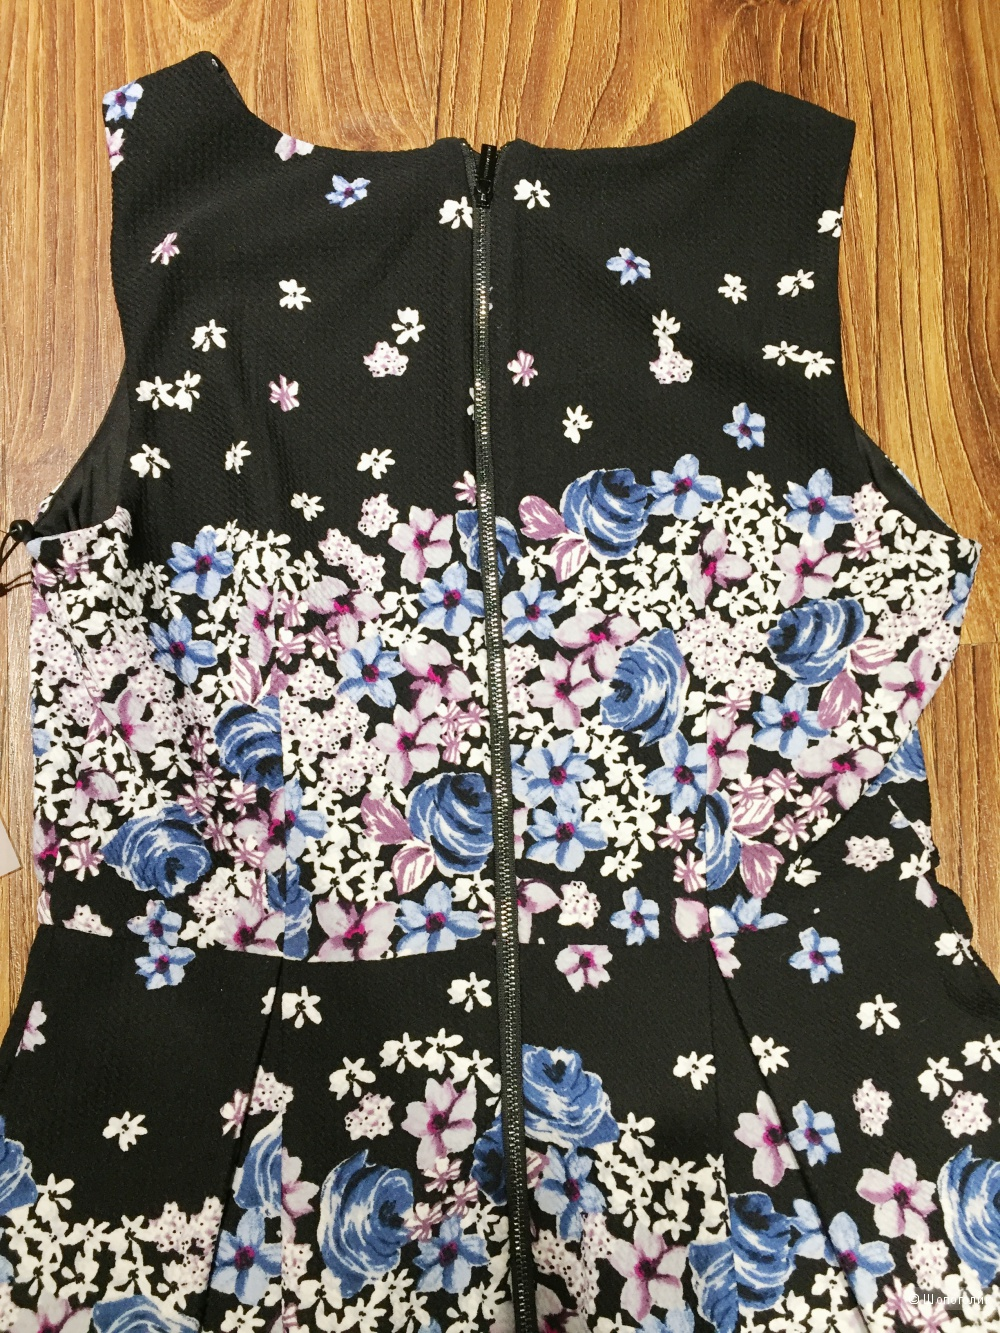 KARL LAGERFELD платье. р.46 (46-48)